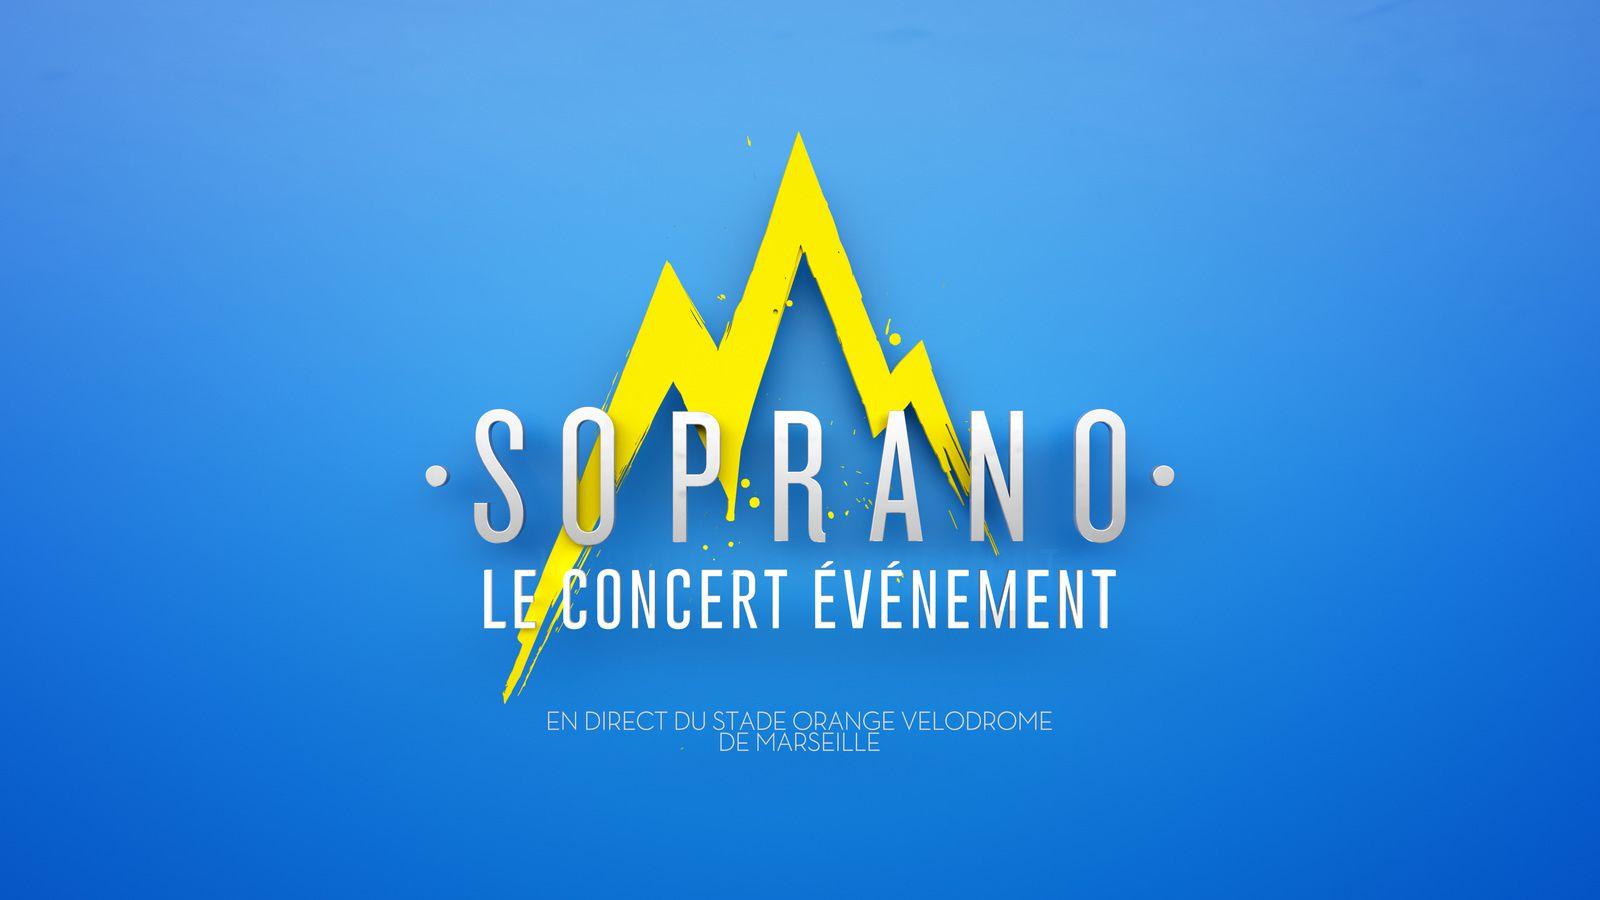 TMC diffuse le concert de Soprano en direct de Marseille ce samedi soir